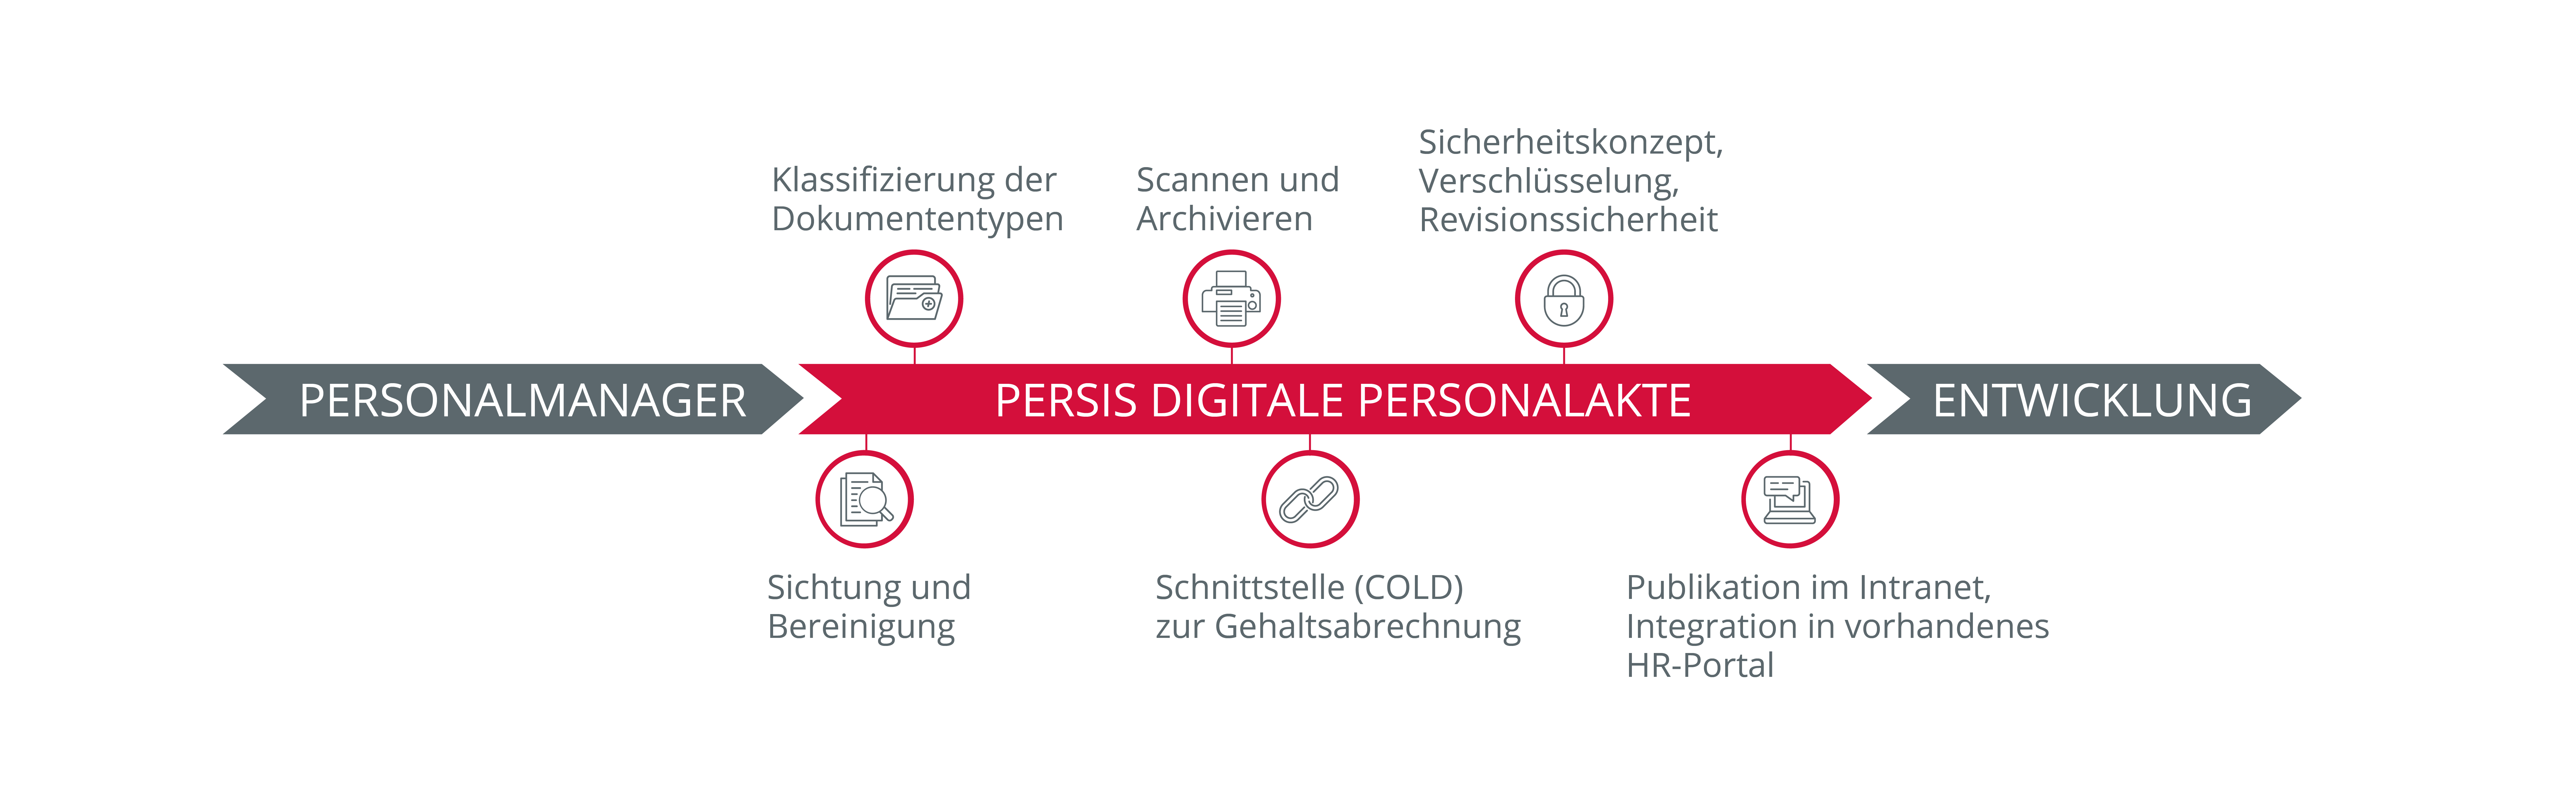 Prozessgrafik Digitale Personalakte